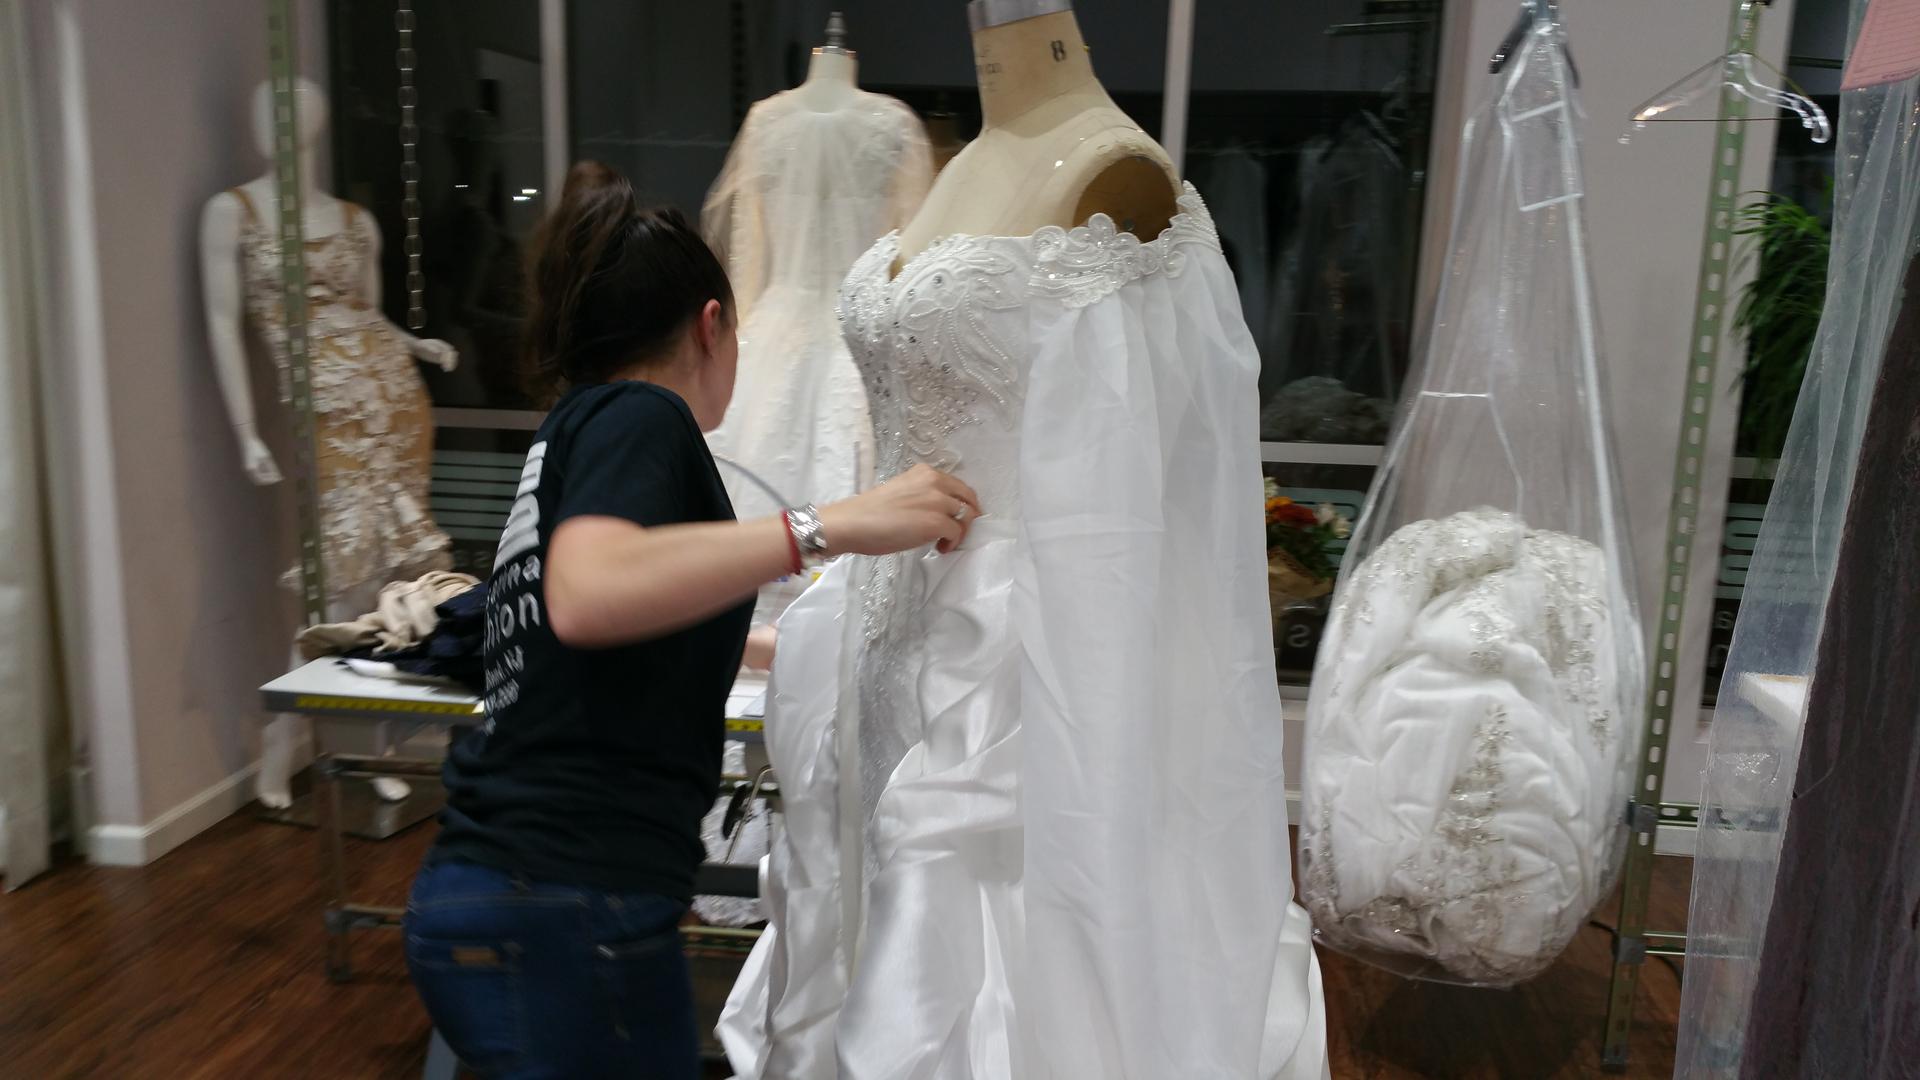 Bridal Dress Alterations Prom Alterations Wedding Dress Design